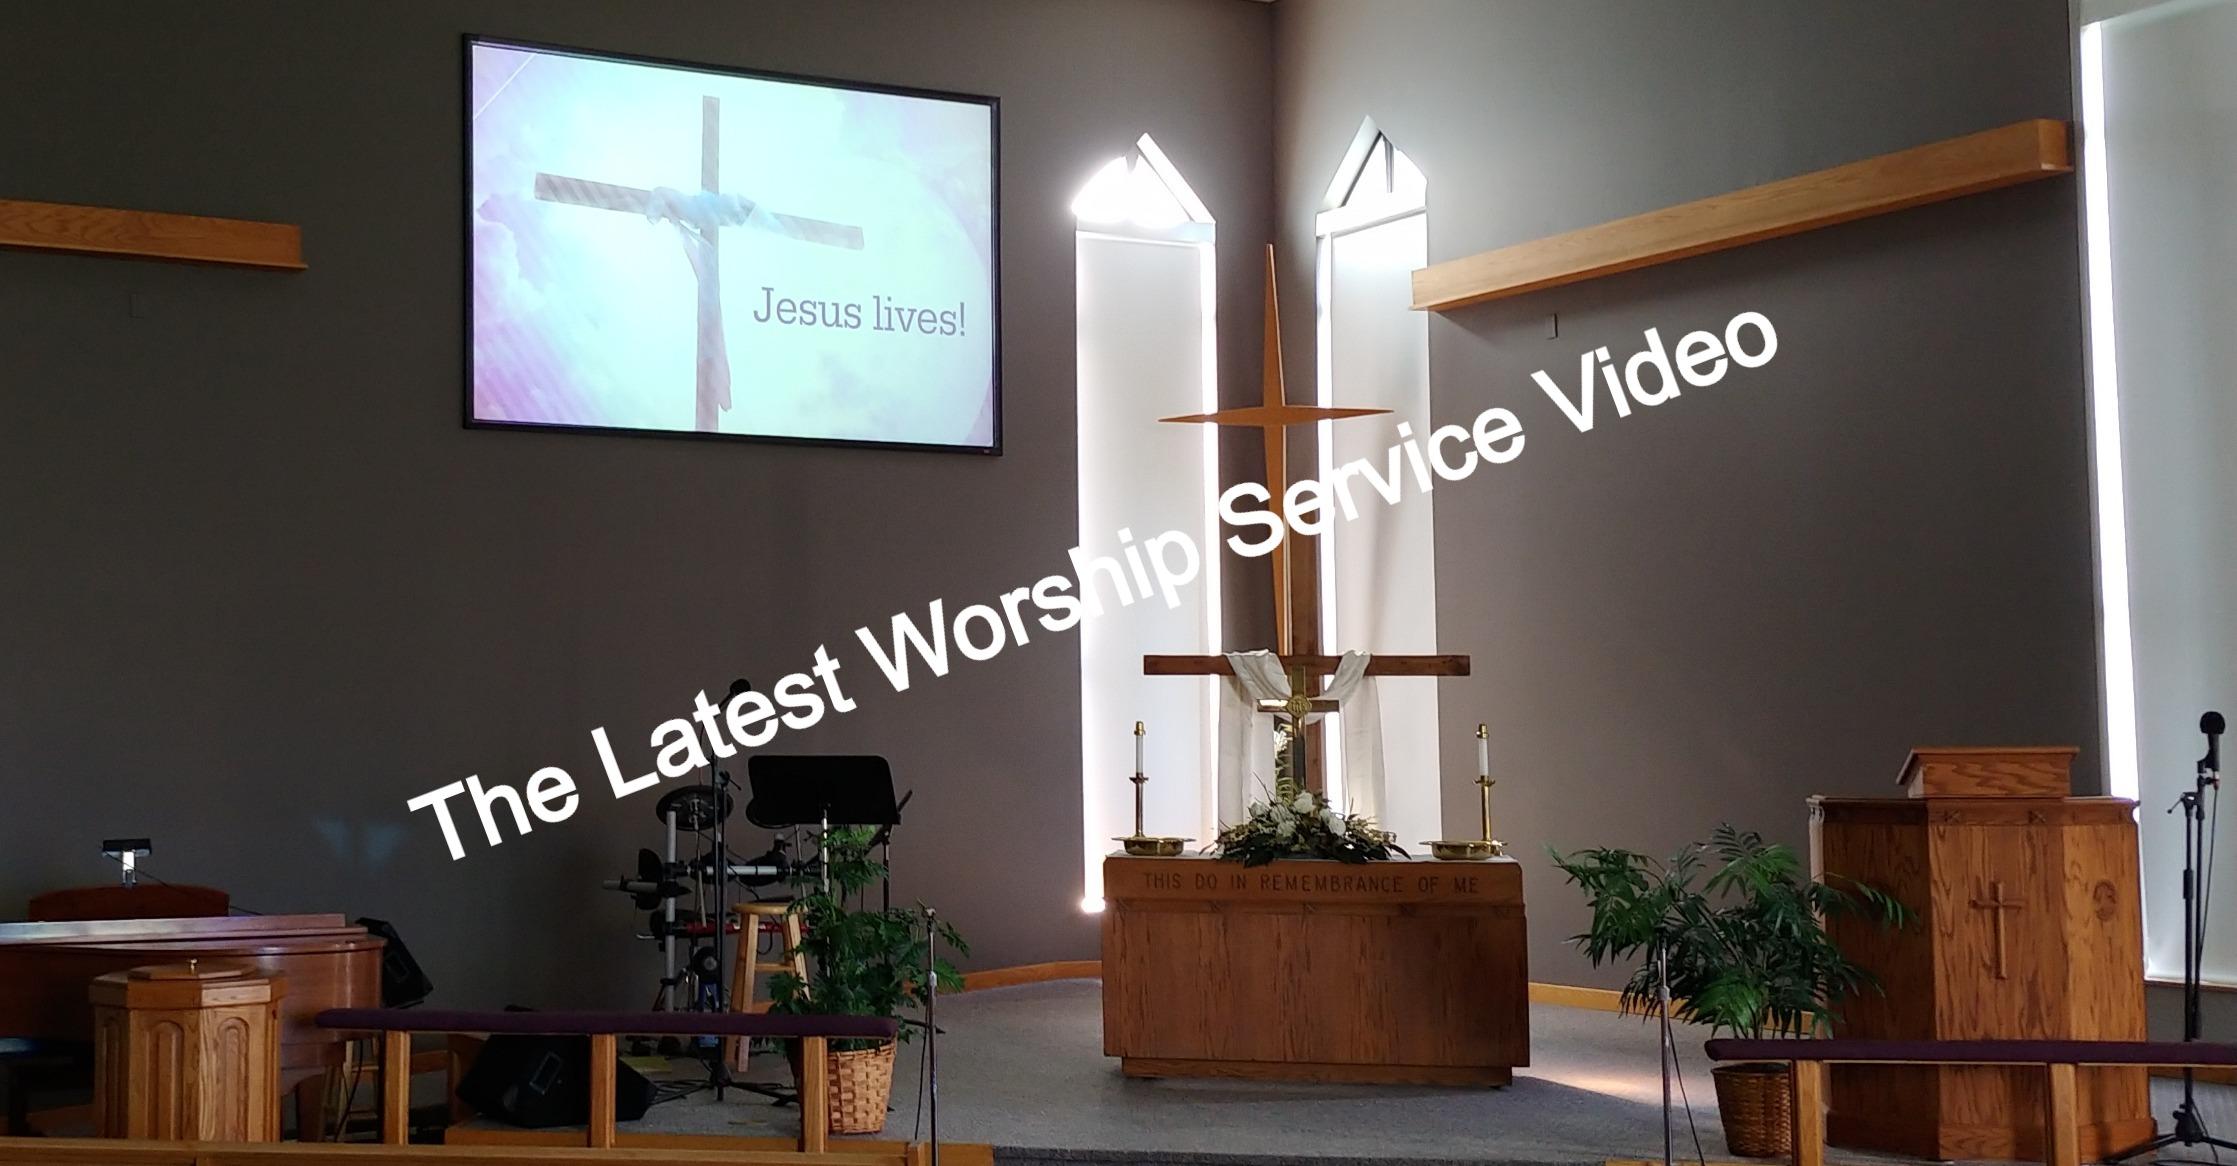 Latest Worship Service Video